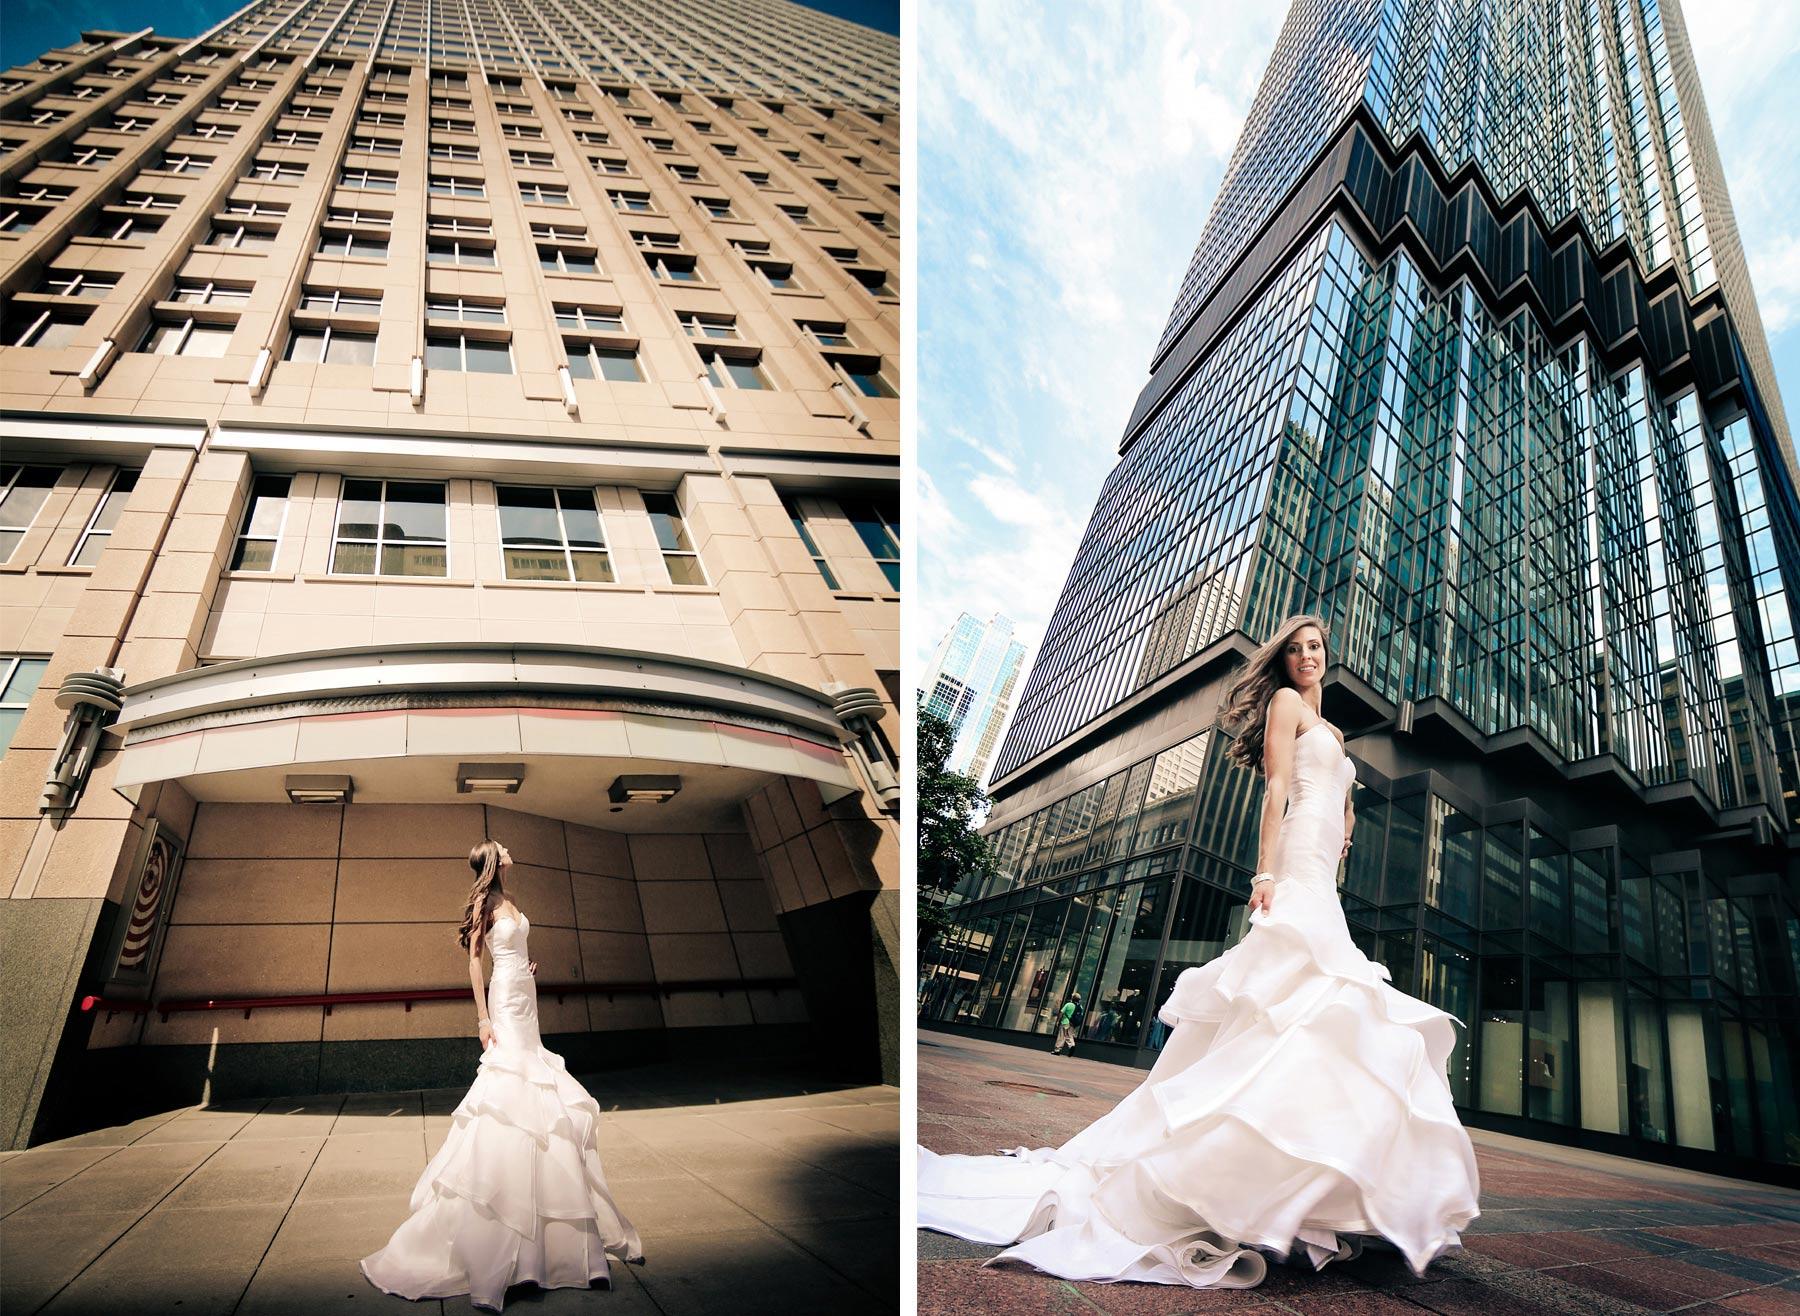 10-Minneapolis-Minnesota-Wedding-Photography-by-Vick-Photography-Downtown-Katie-&-Joe.jpg